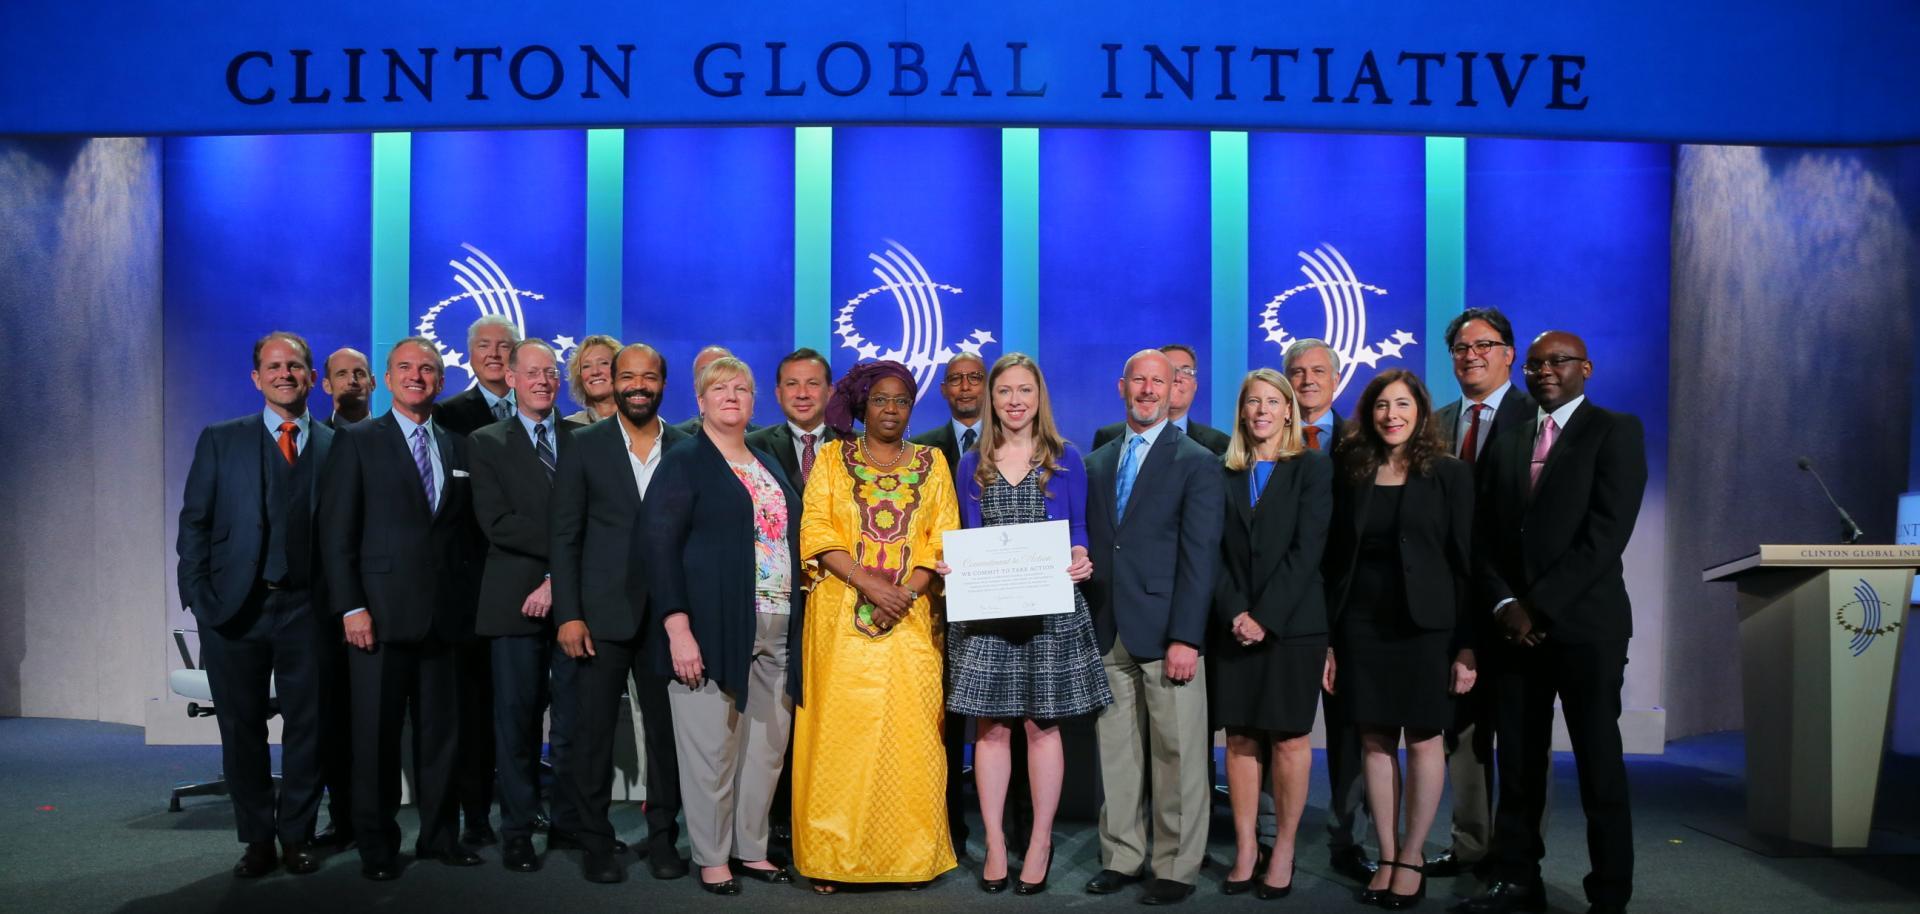 Dr. Stephen Kahn,  far left. Photo from Clinton Global Initiative website.